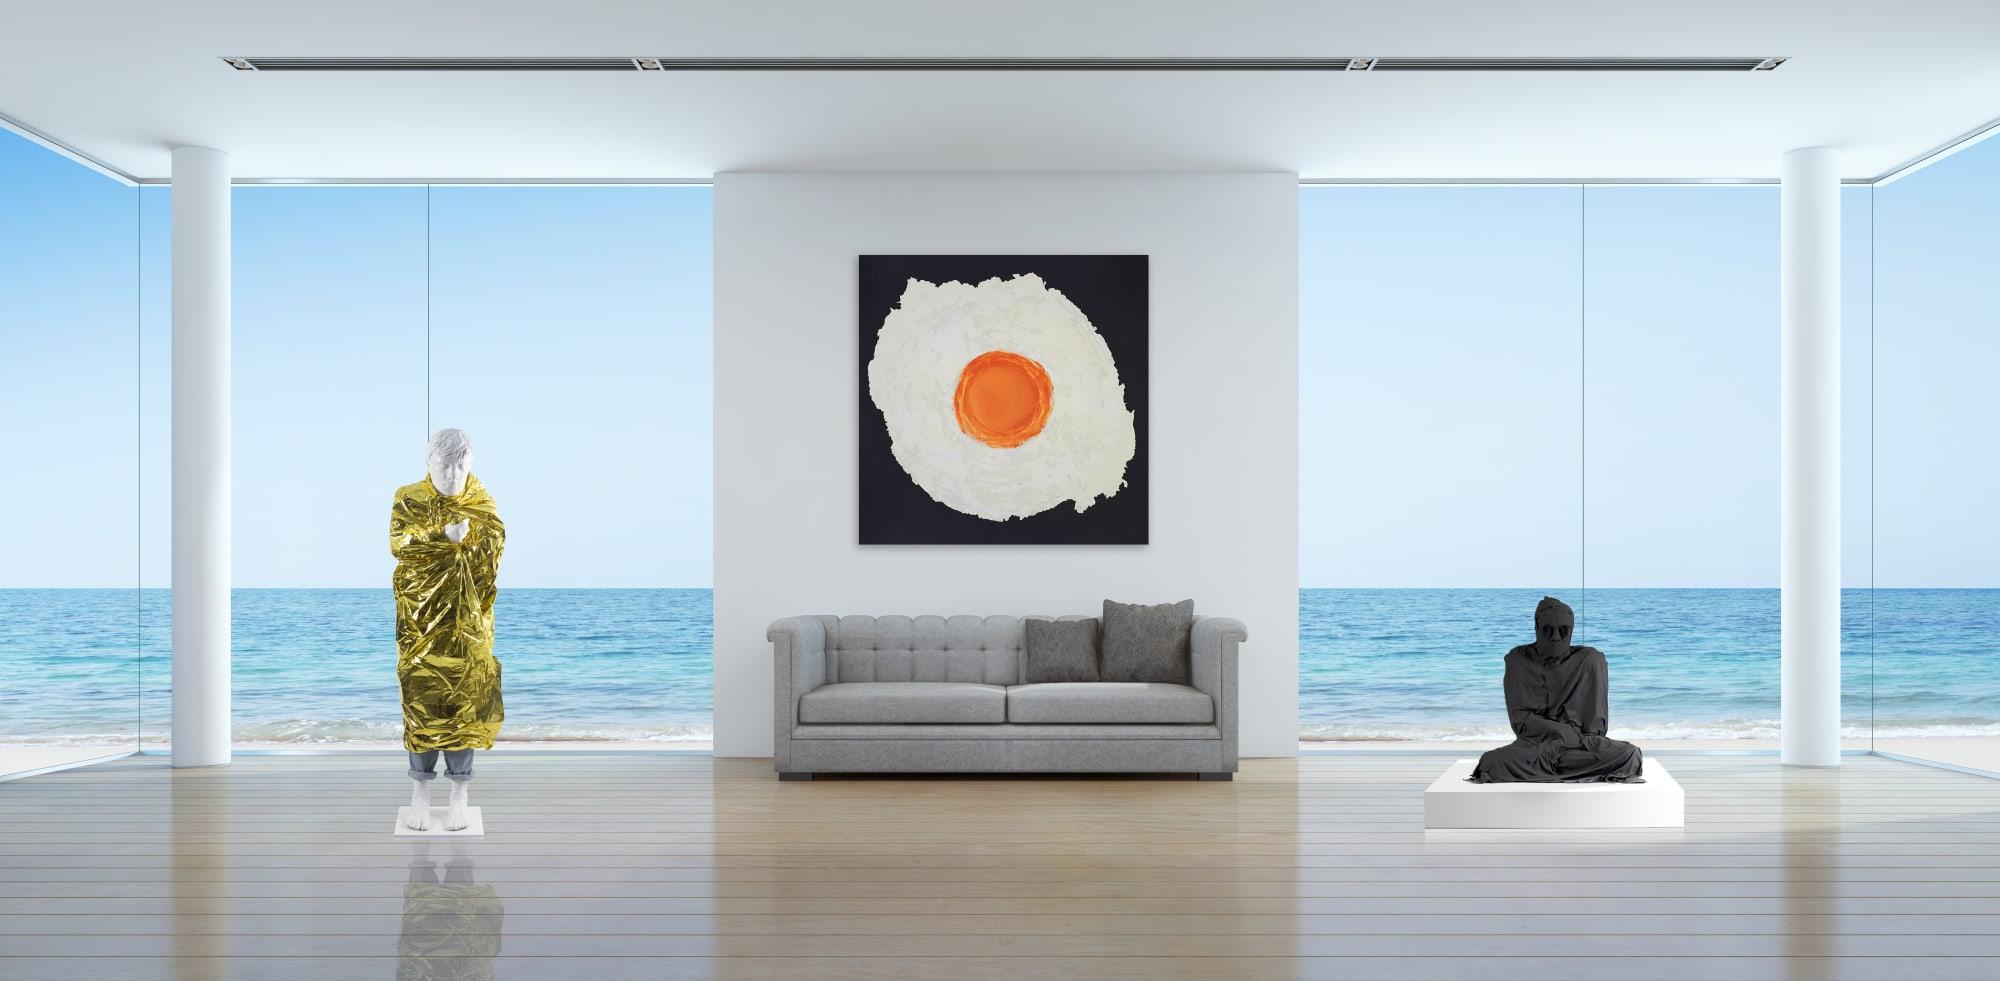 Viewing Room: Mattia Novello